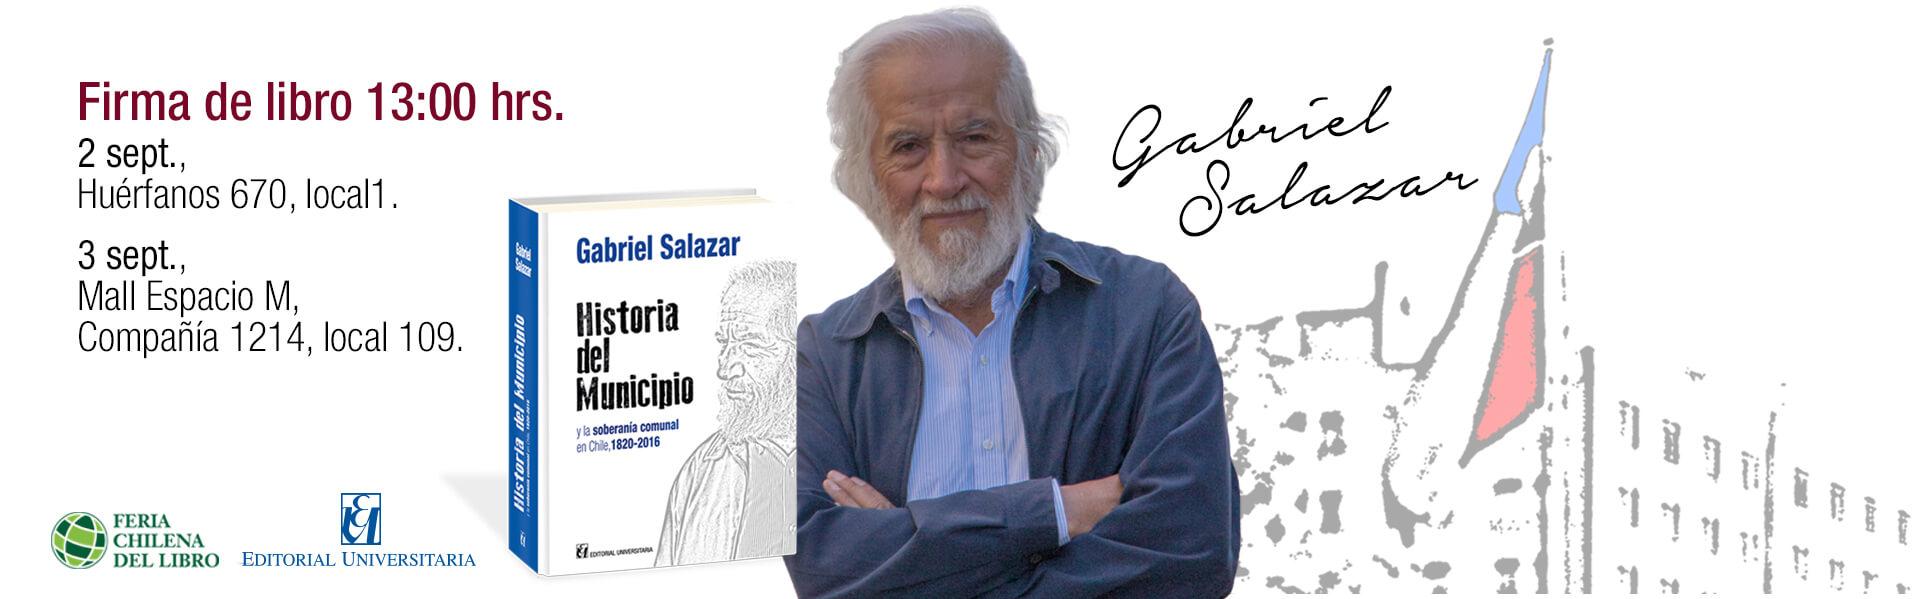 Gabriel Salazar Historia del Municipio